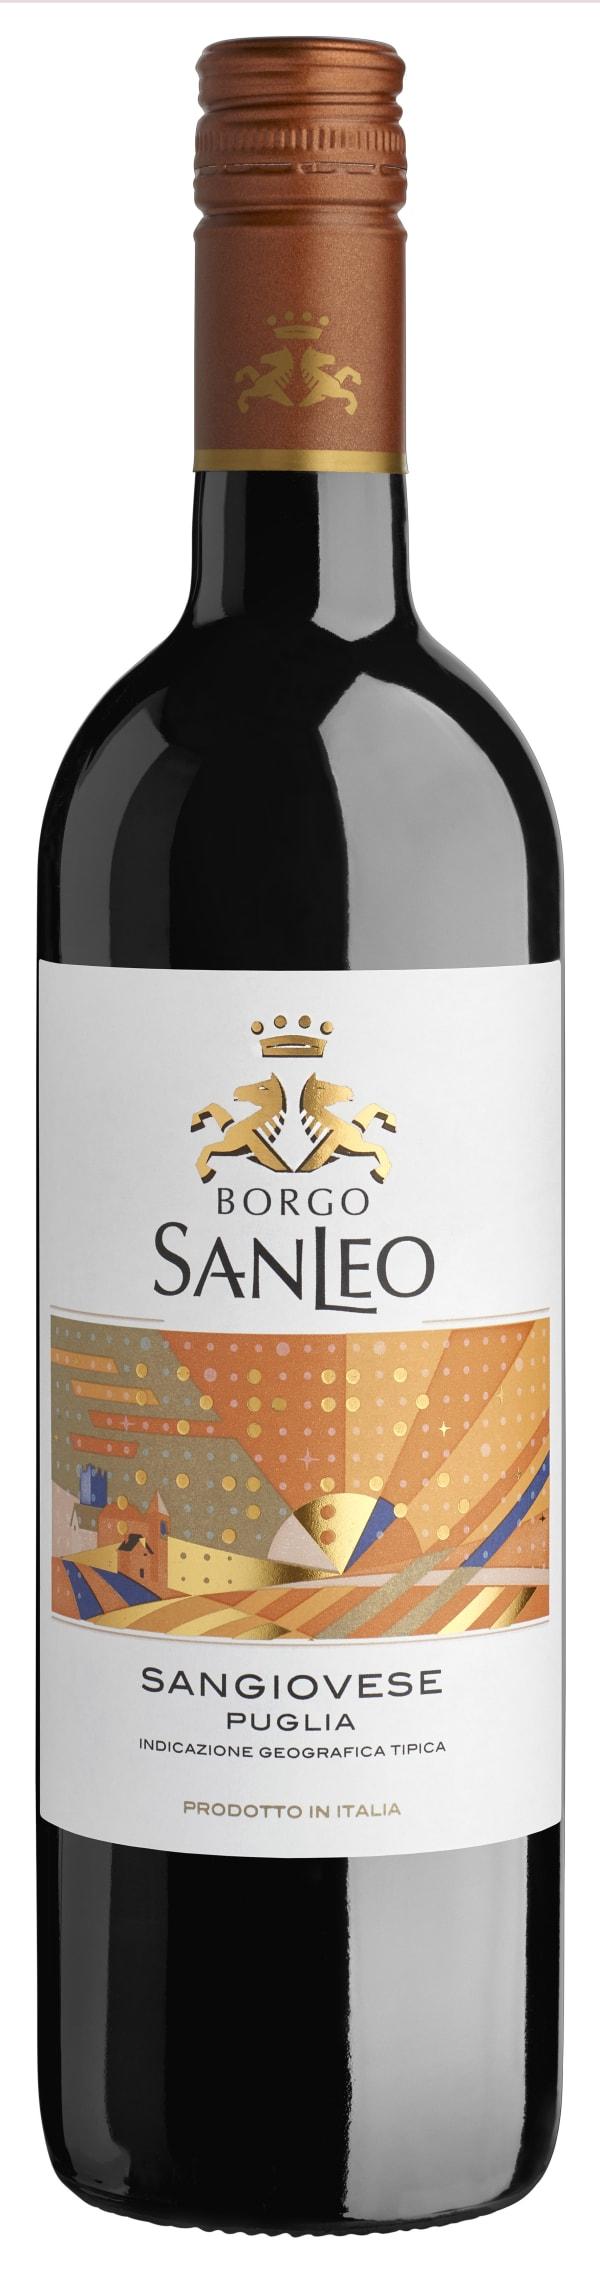 Borgo San Leo Sangiovese 2014